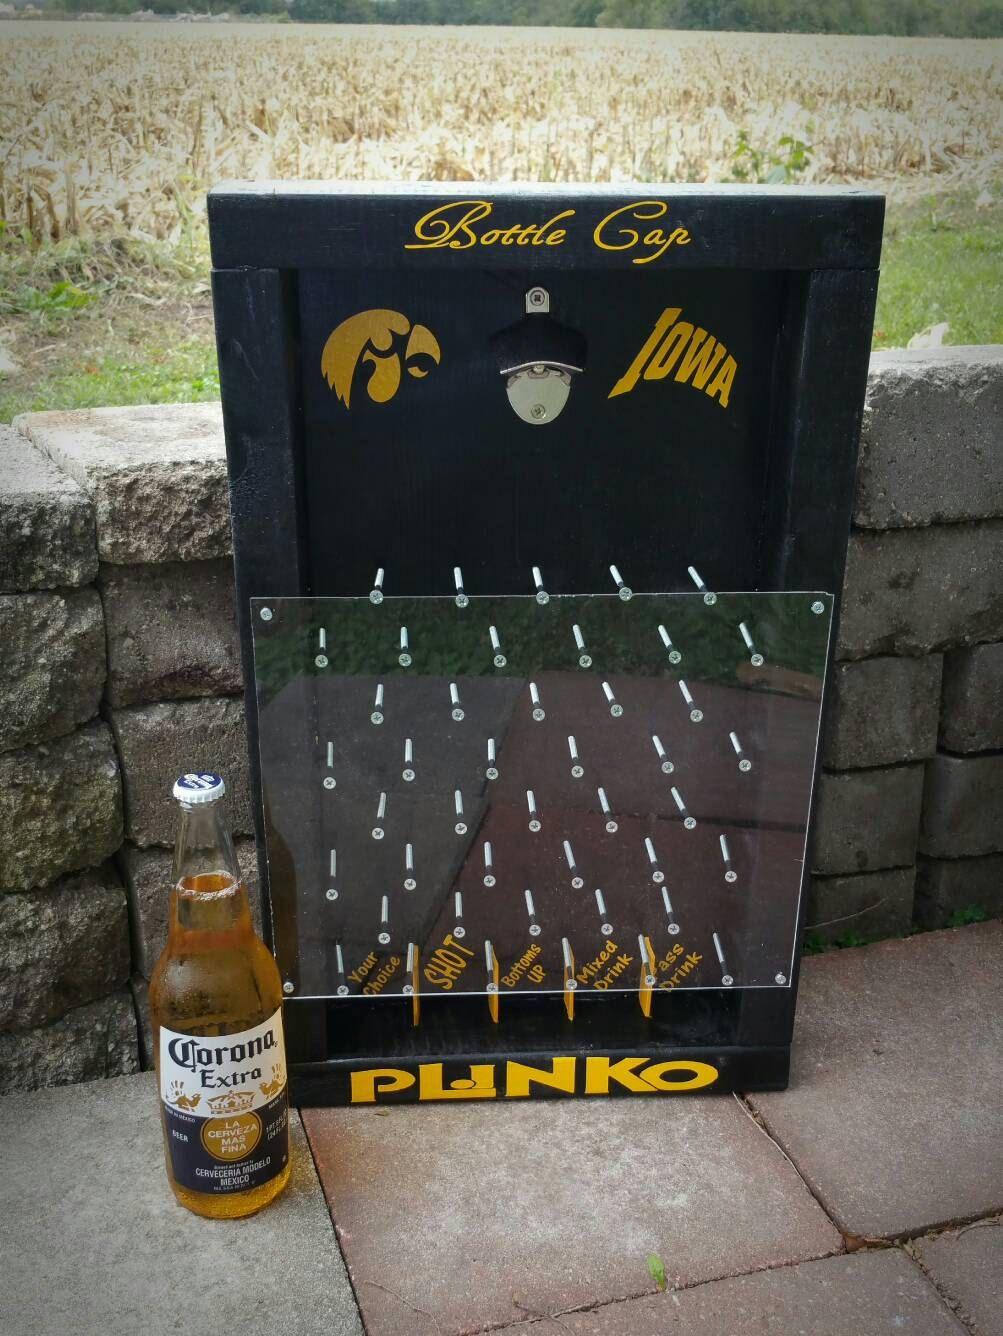 How to Build a Plinko Board | Plinko game, Plinko board ...